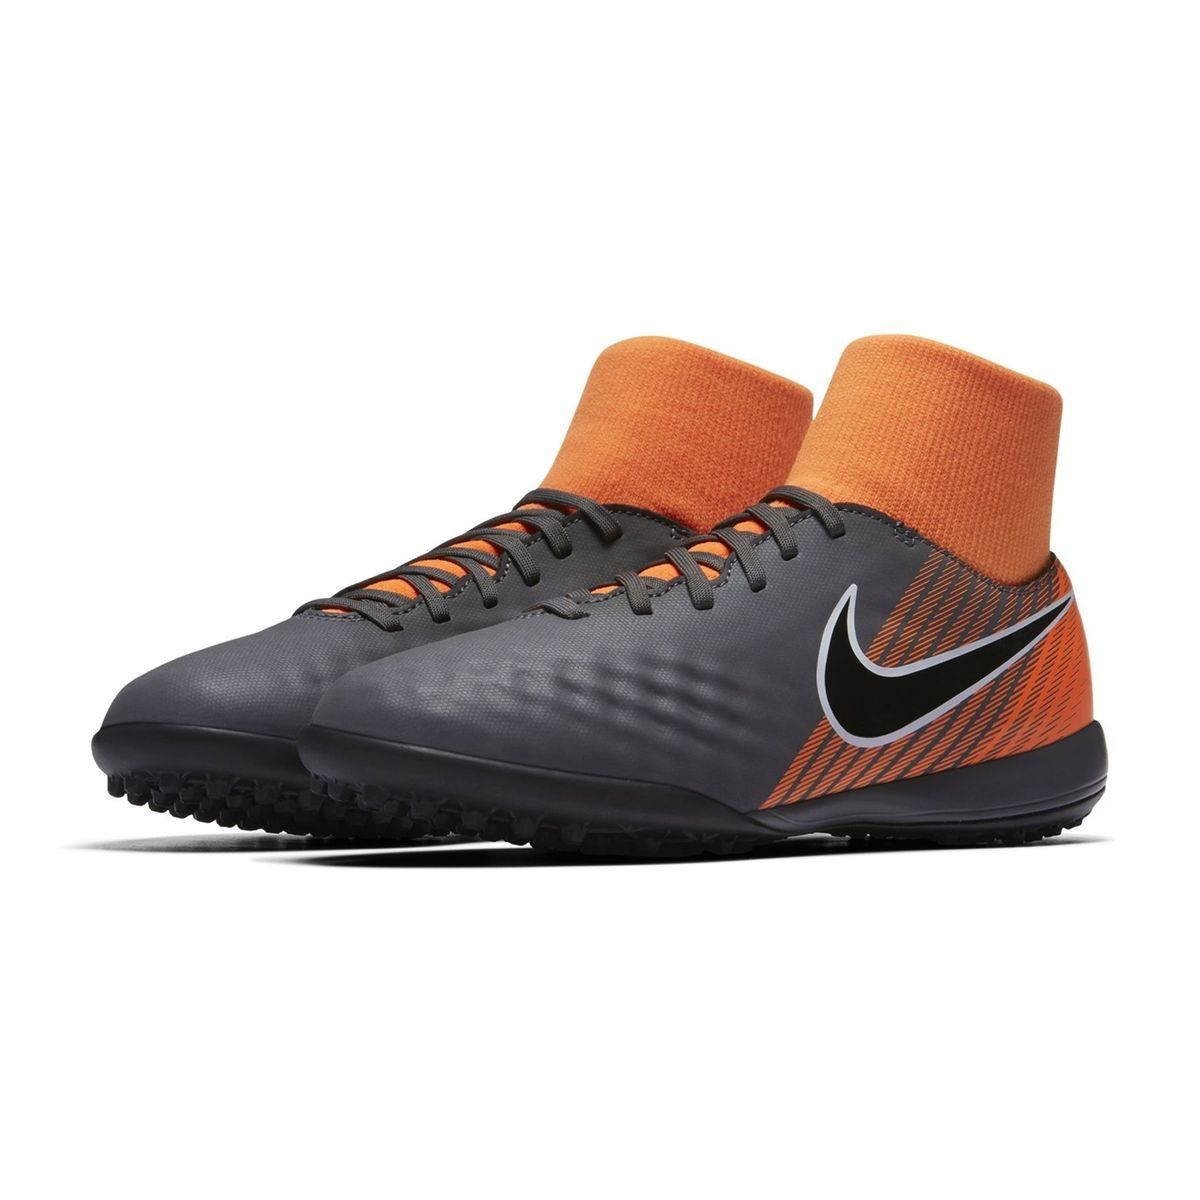 3400f3da1129 Chaussures Football Chaussure De Football Nike Magistax Obra Ii Academy Df  Tf Gris orange Junior